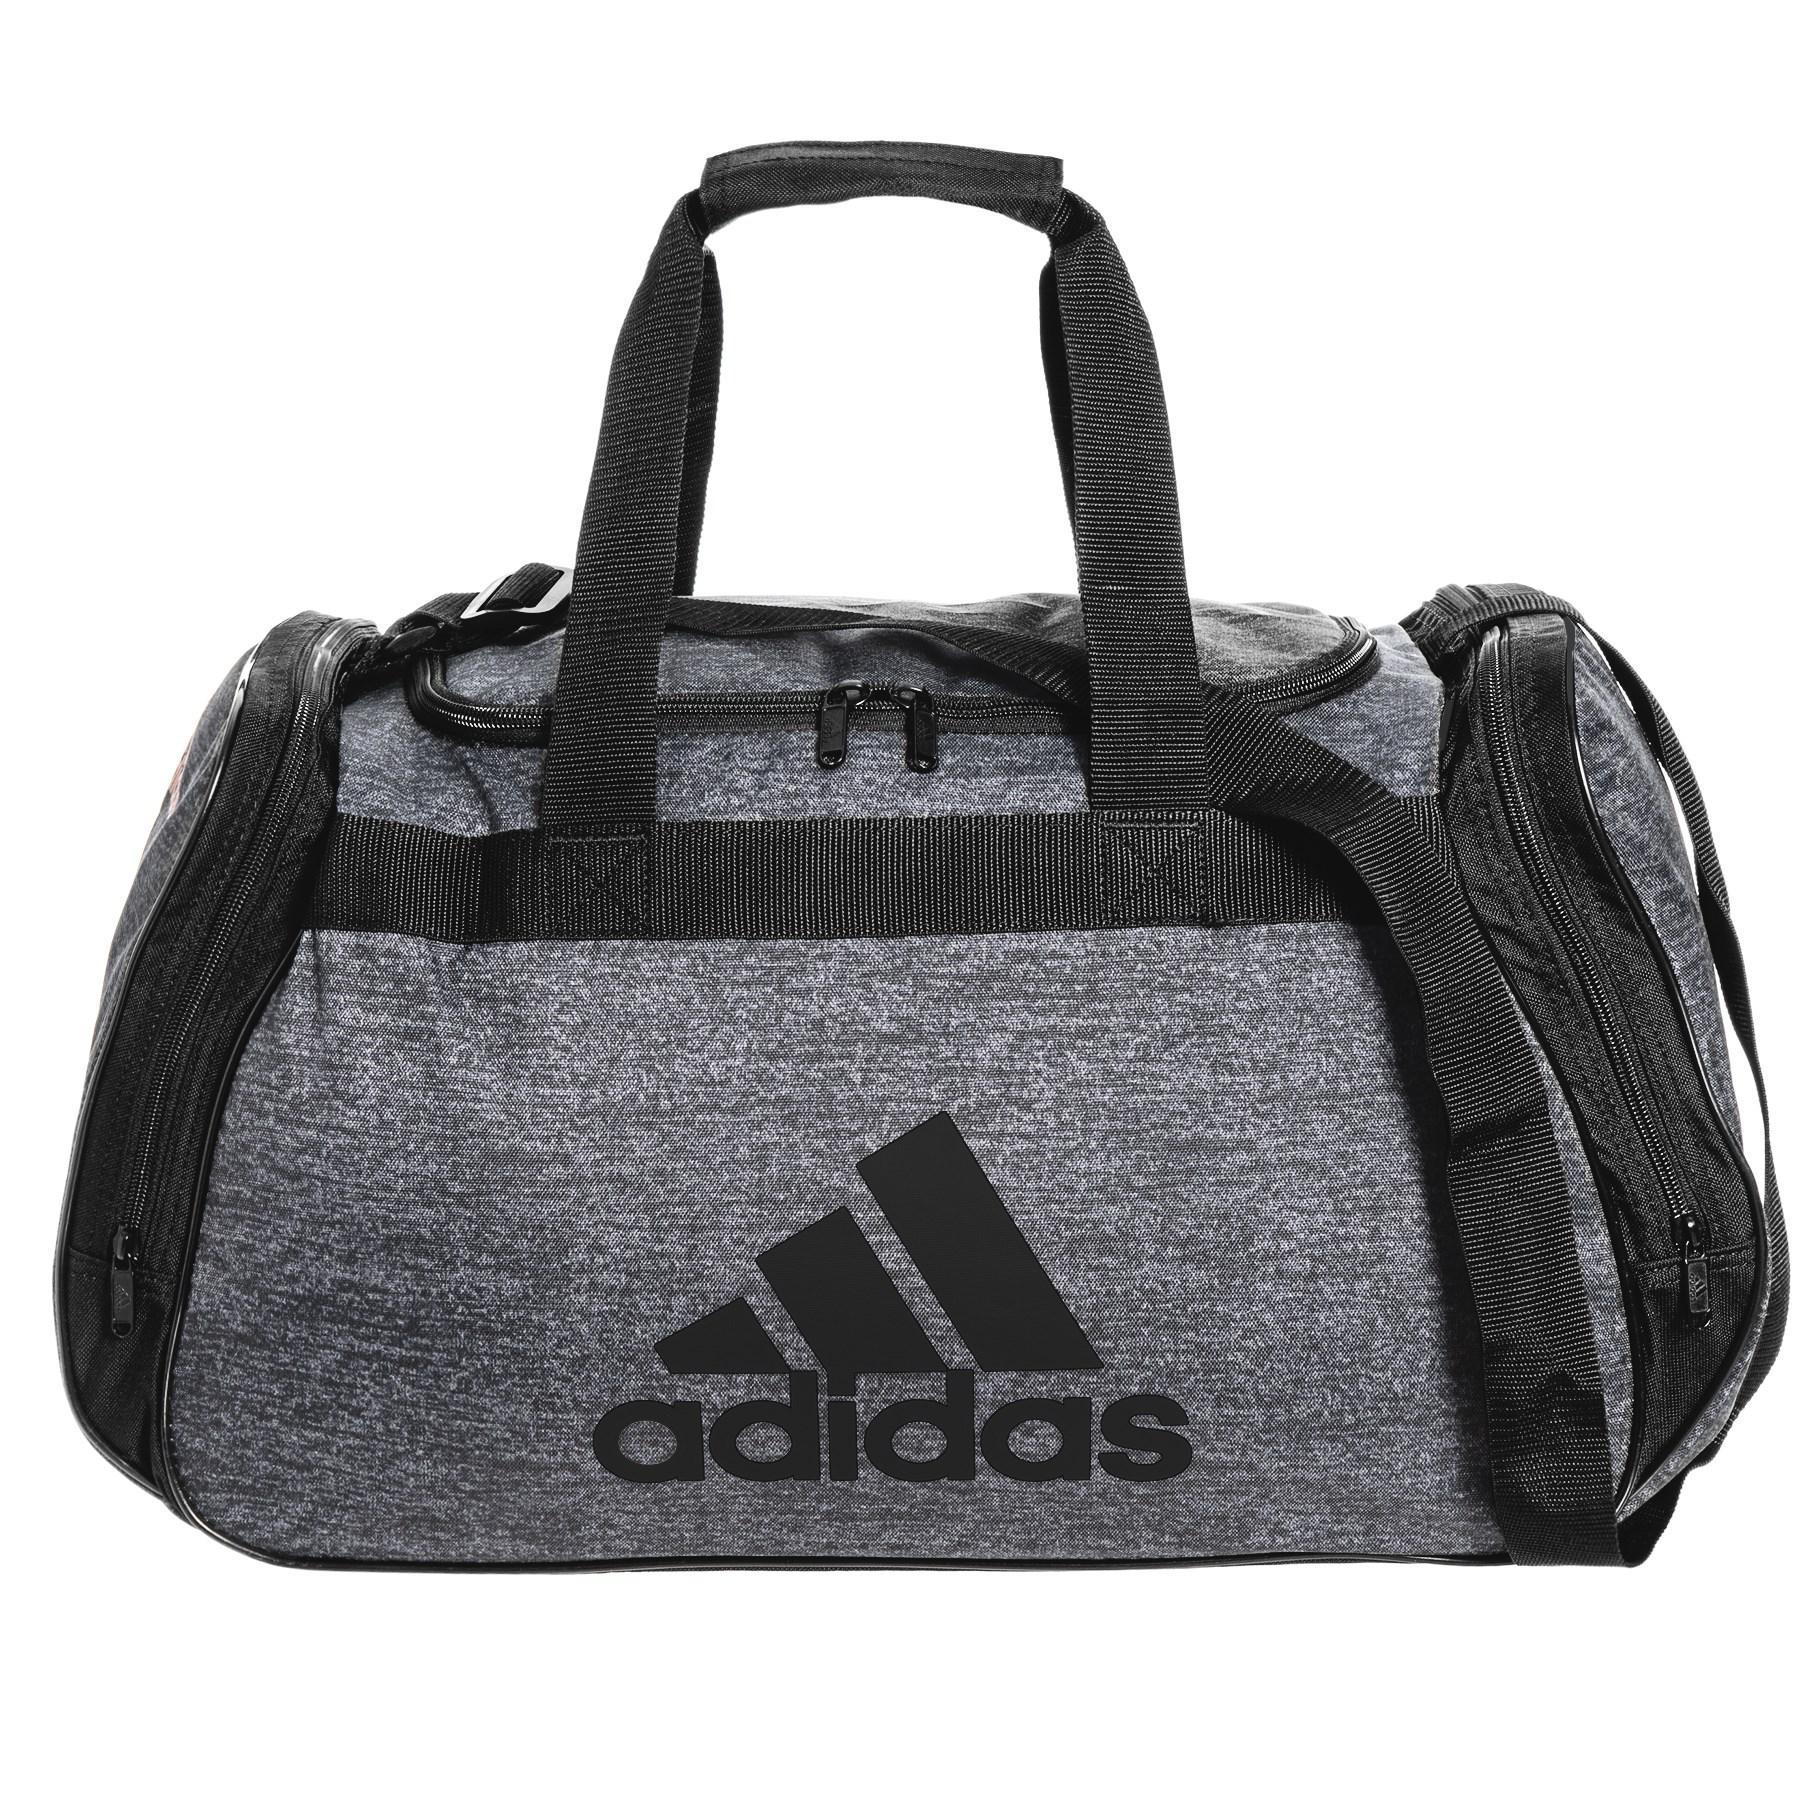 Lyst - Adidas Diablo Medium Ii Duffel Bag in Black for Men 53d05a61ec6b9